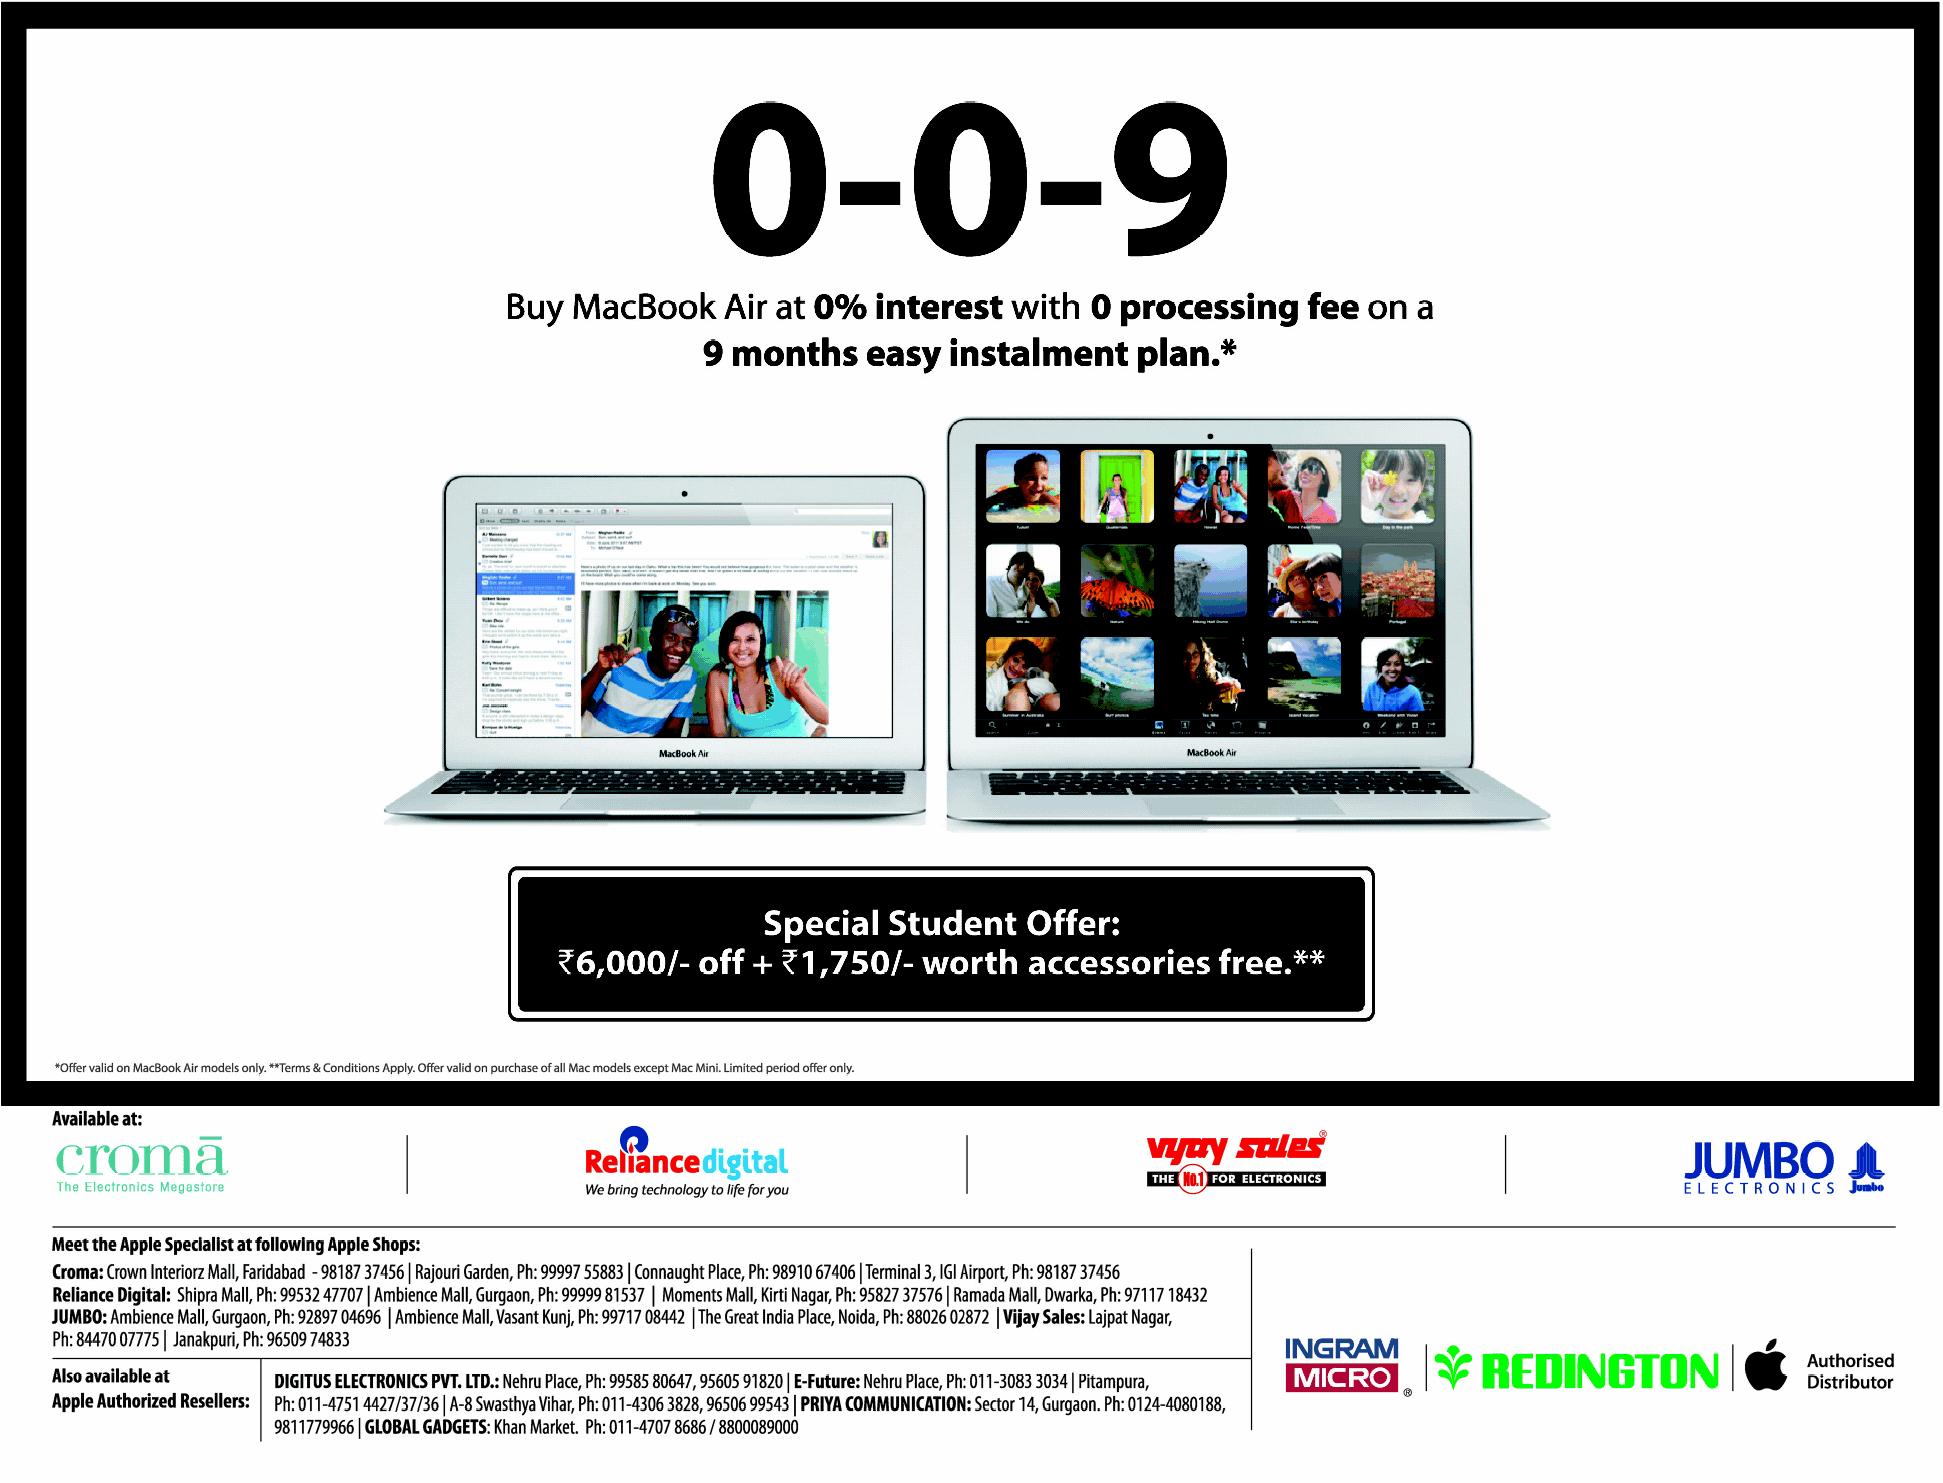 macbook special offer